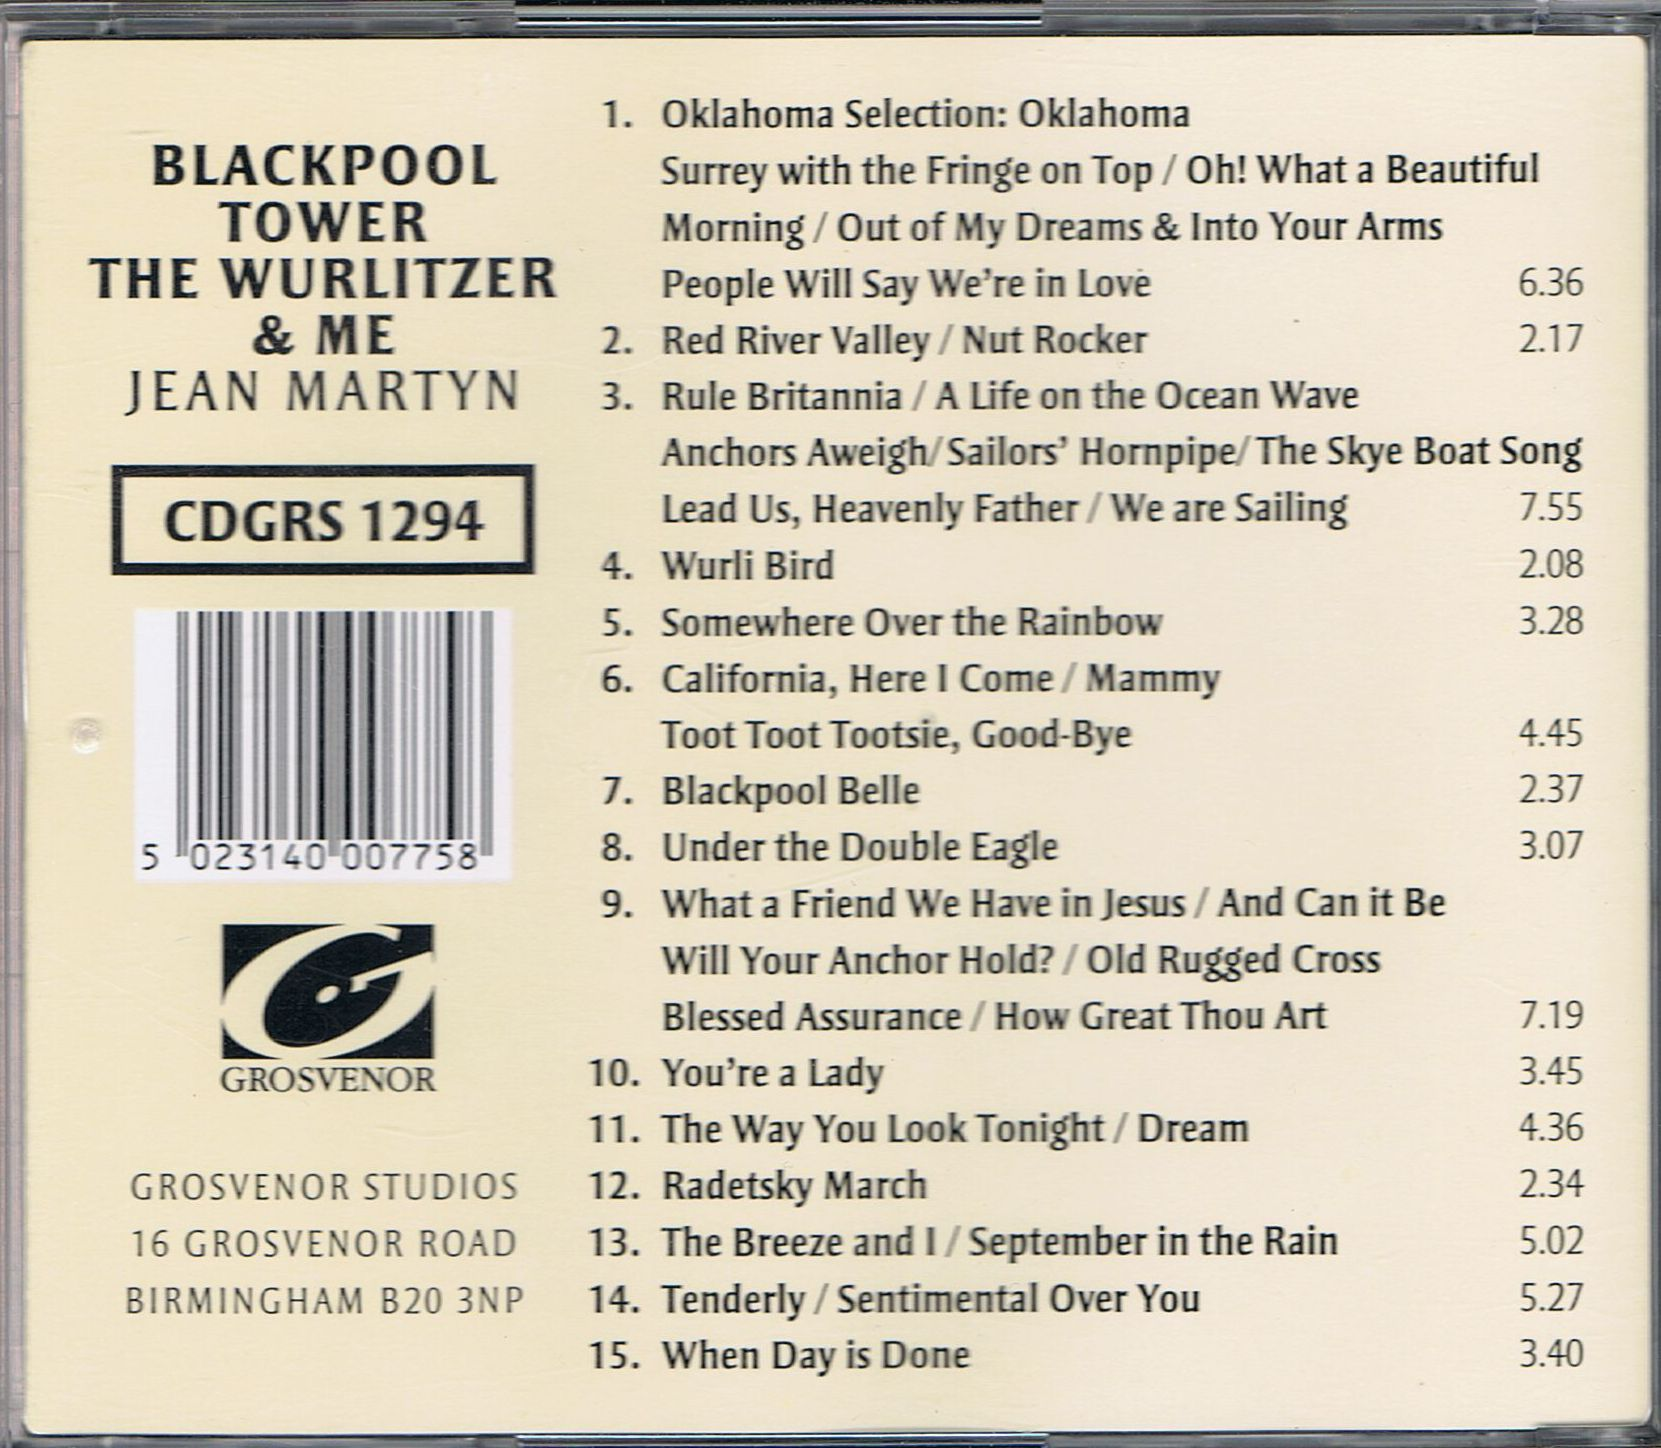 Jean Martyn - Blackpool Tower, The Wurlitzer & Me